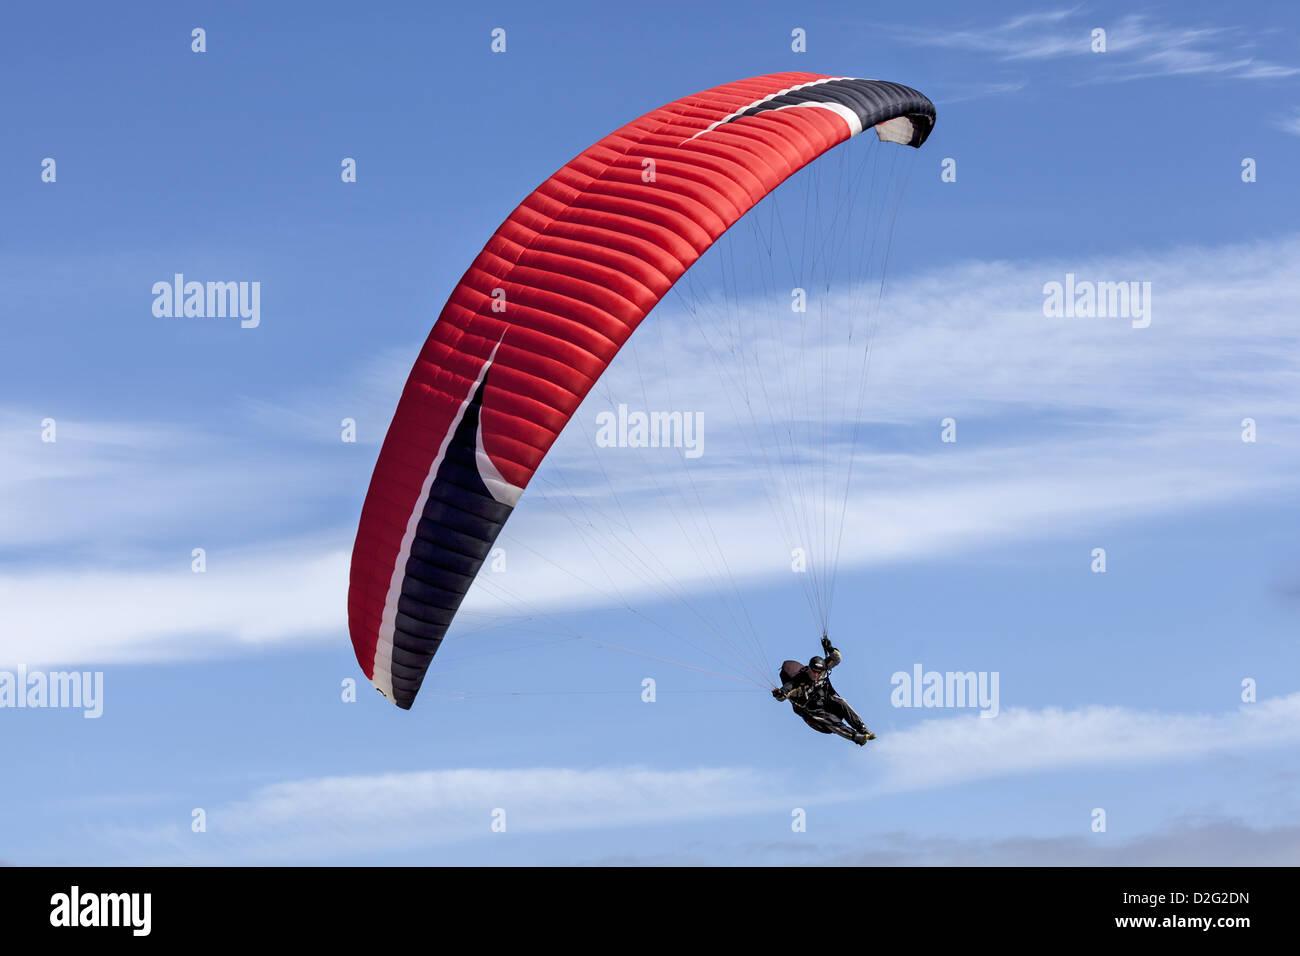 A single paraglider soaring with his Niviuk Artik 2 chute - Stock Image